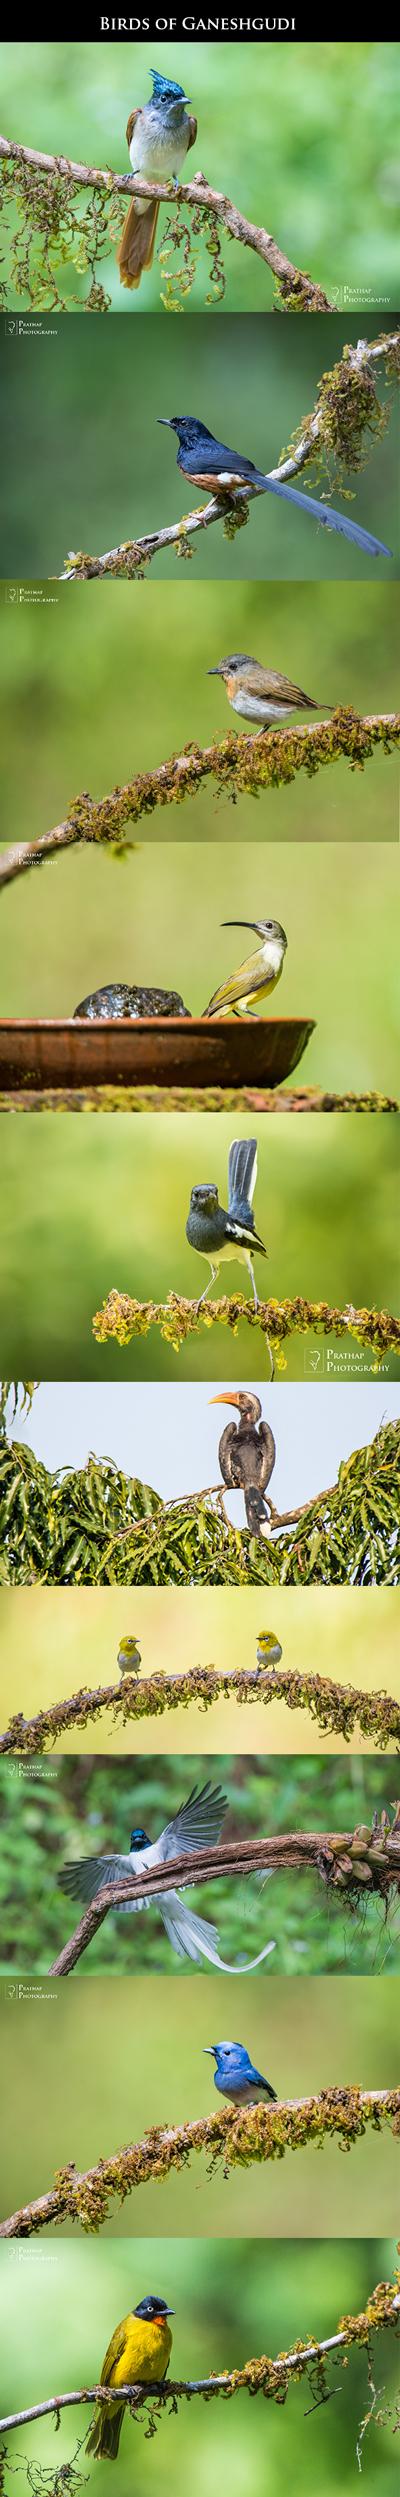 Bird Photography Workshop in Ganeshgudi, Karnataka, South India. Best Birding Hotspot in South India.